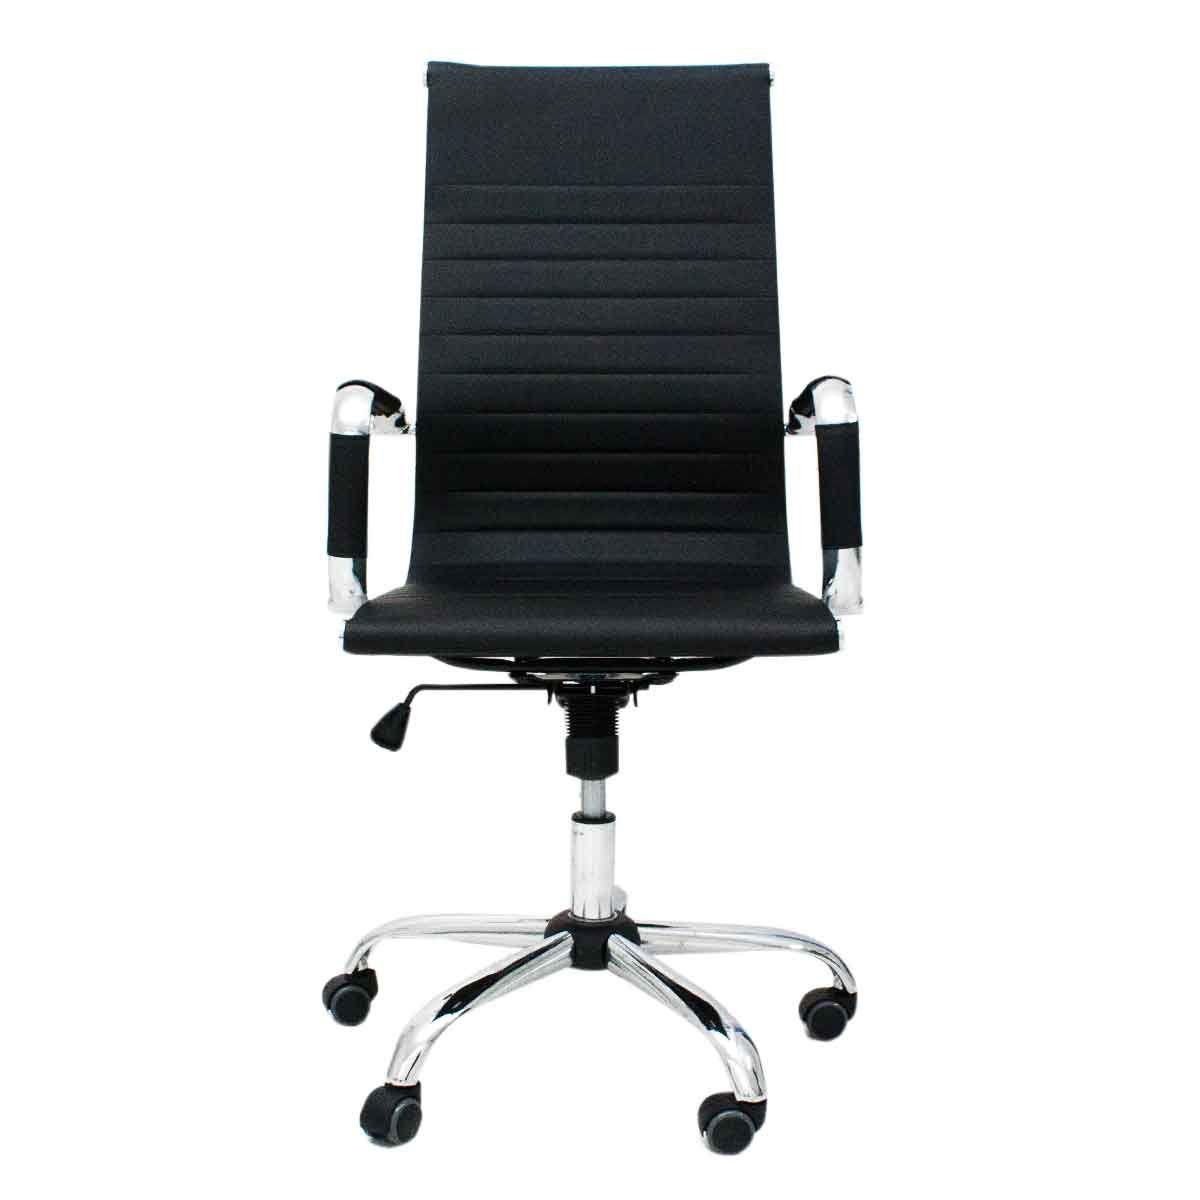 Cadeira Escritório Executiva Presidente Eames Esteira Alta